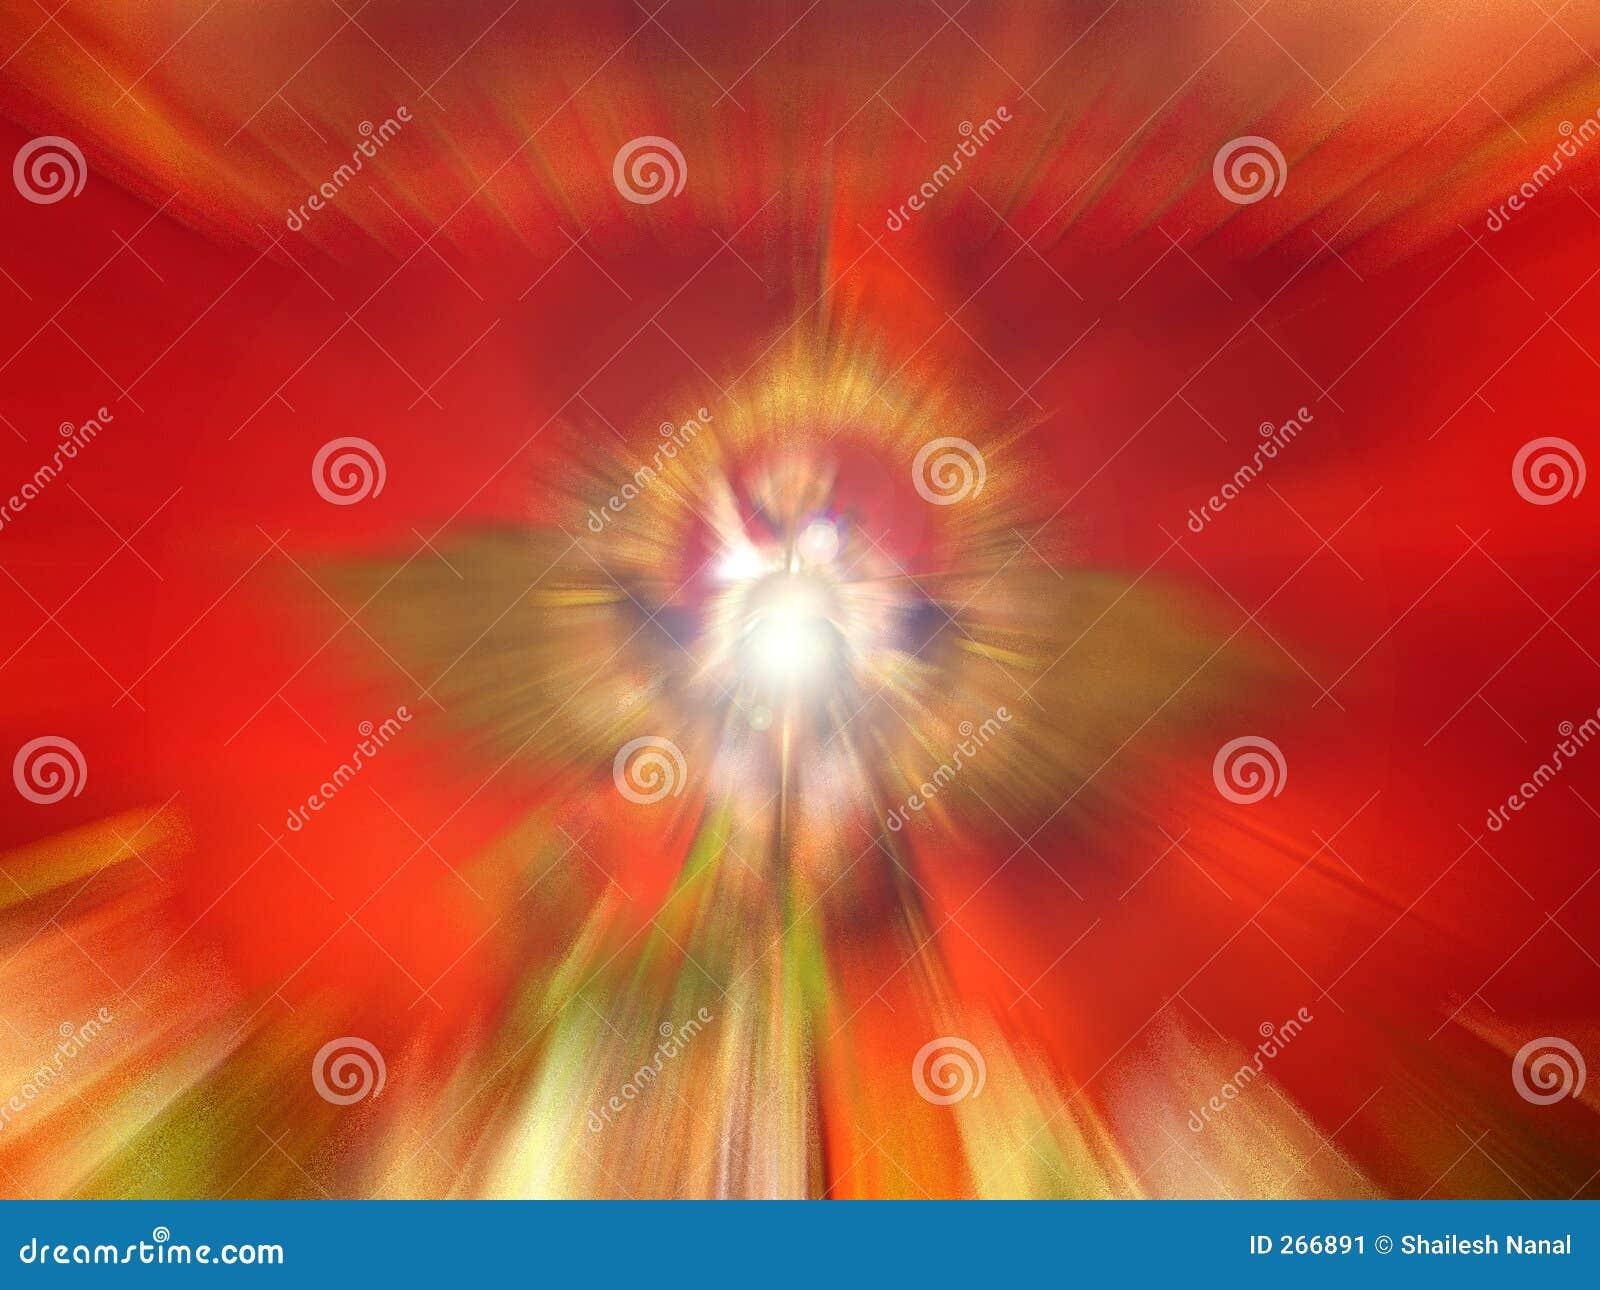 Beautiful spiritual light